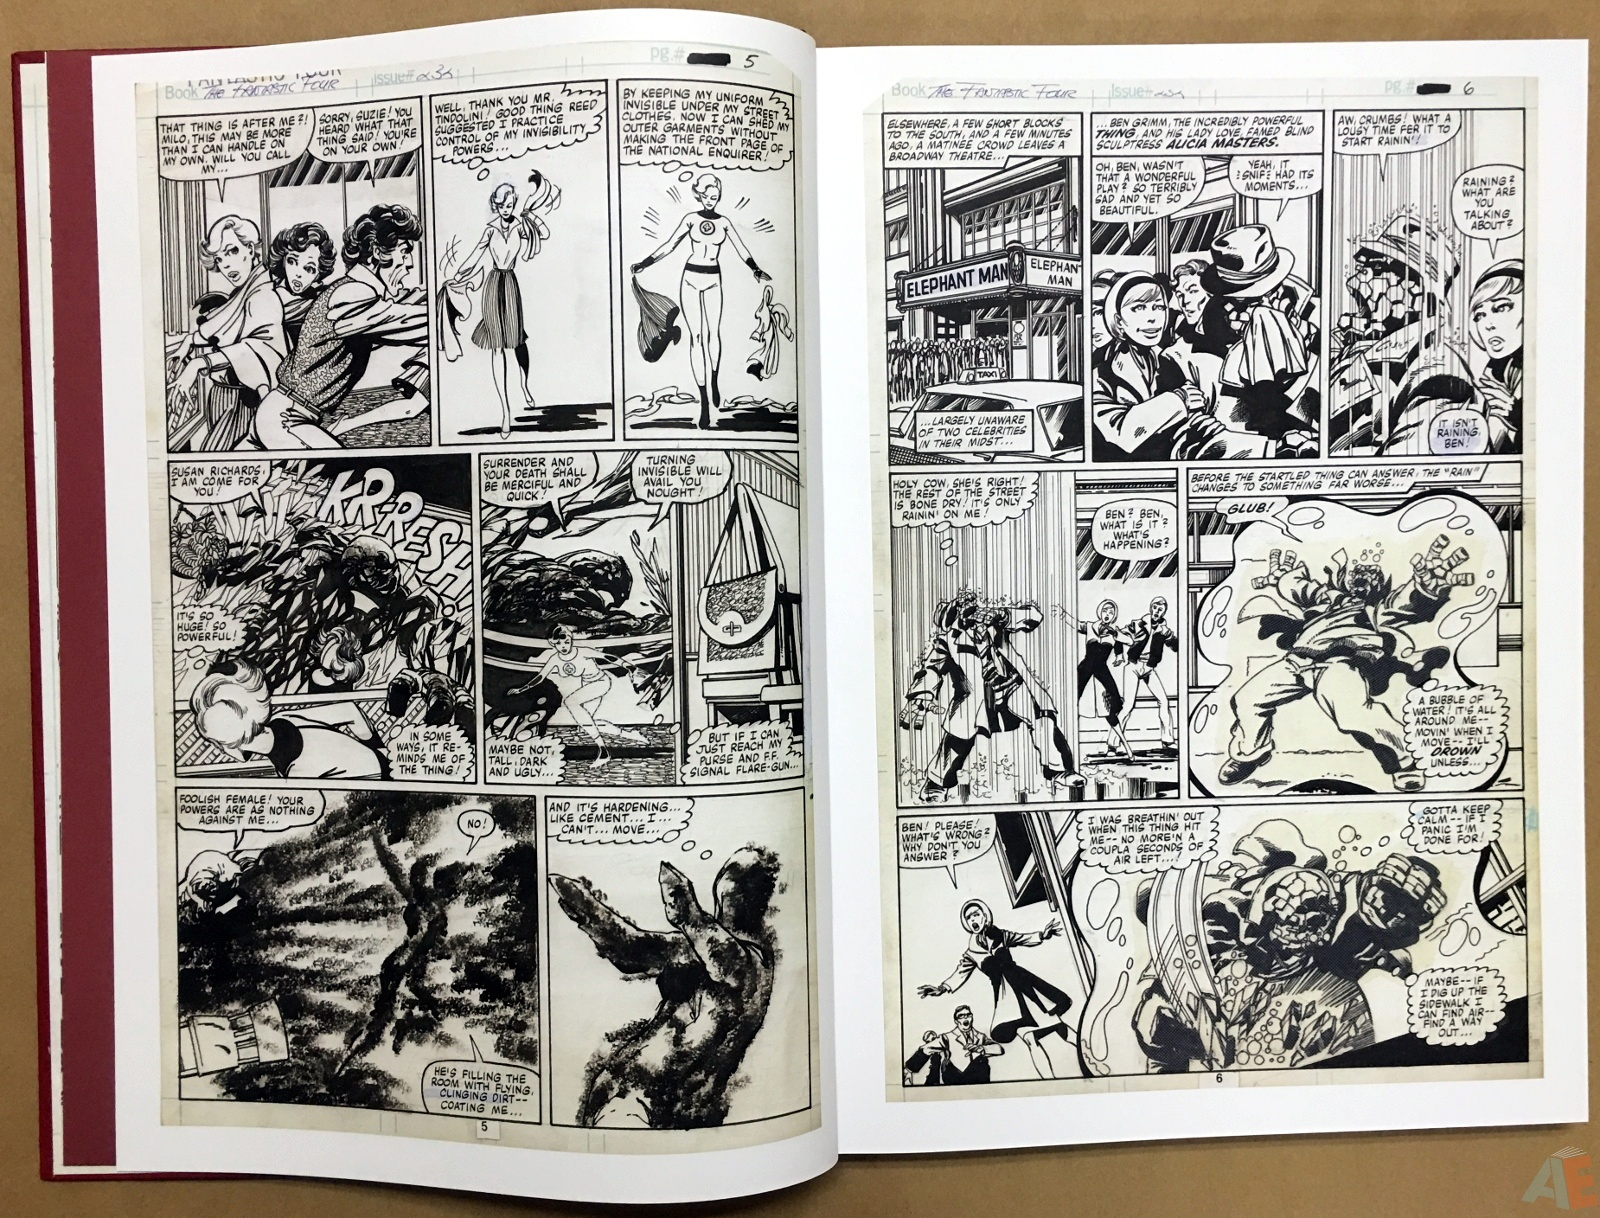 John Byrne's The Fantastic Four Artist's Edition 10